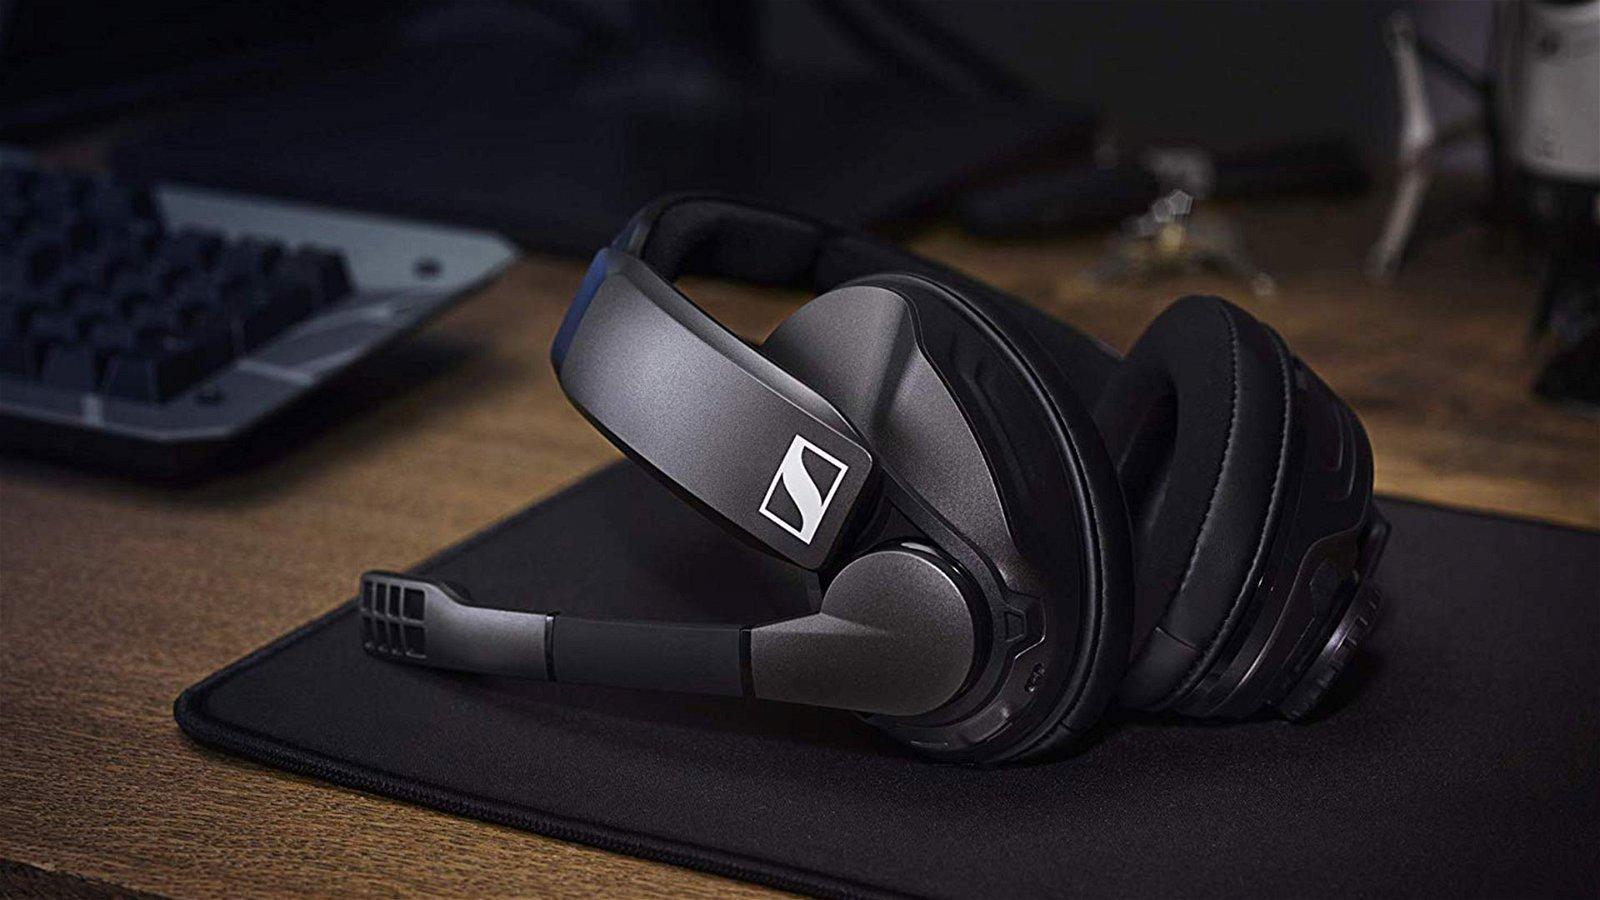 Sennheiser GSP 370 Headset Review 3